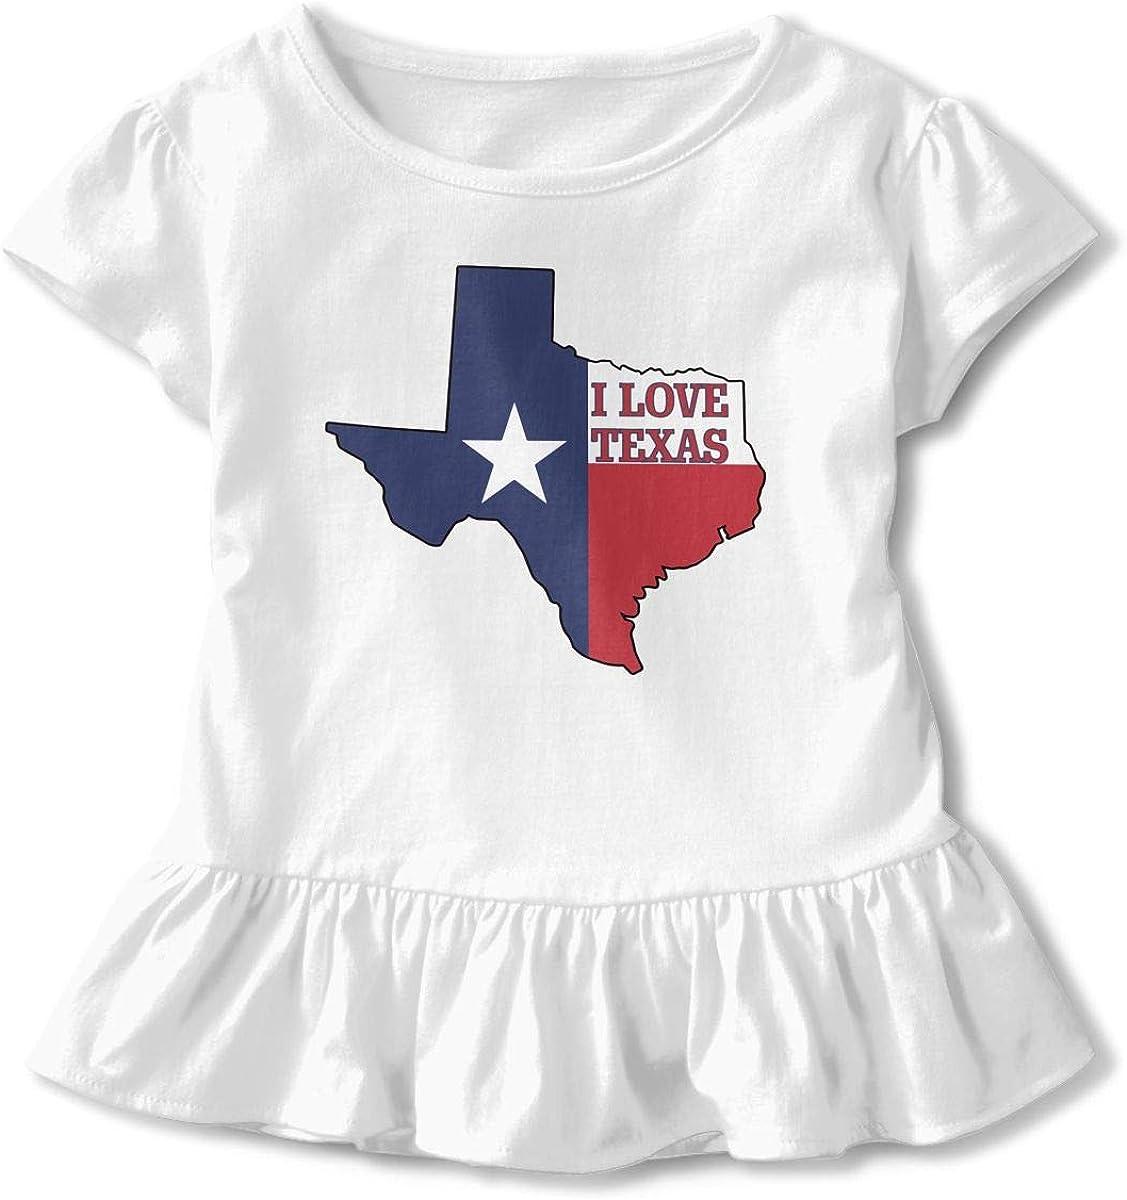 I Love Texas Texan Flag Newborn Baby Short Sleeve Crew Neck T-Shirt